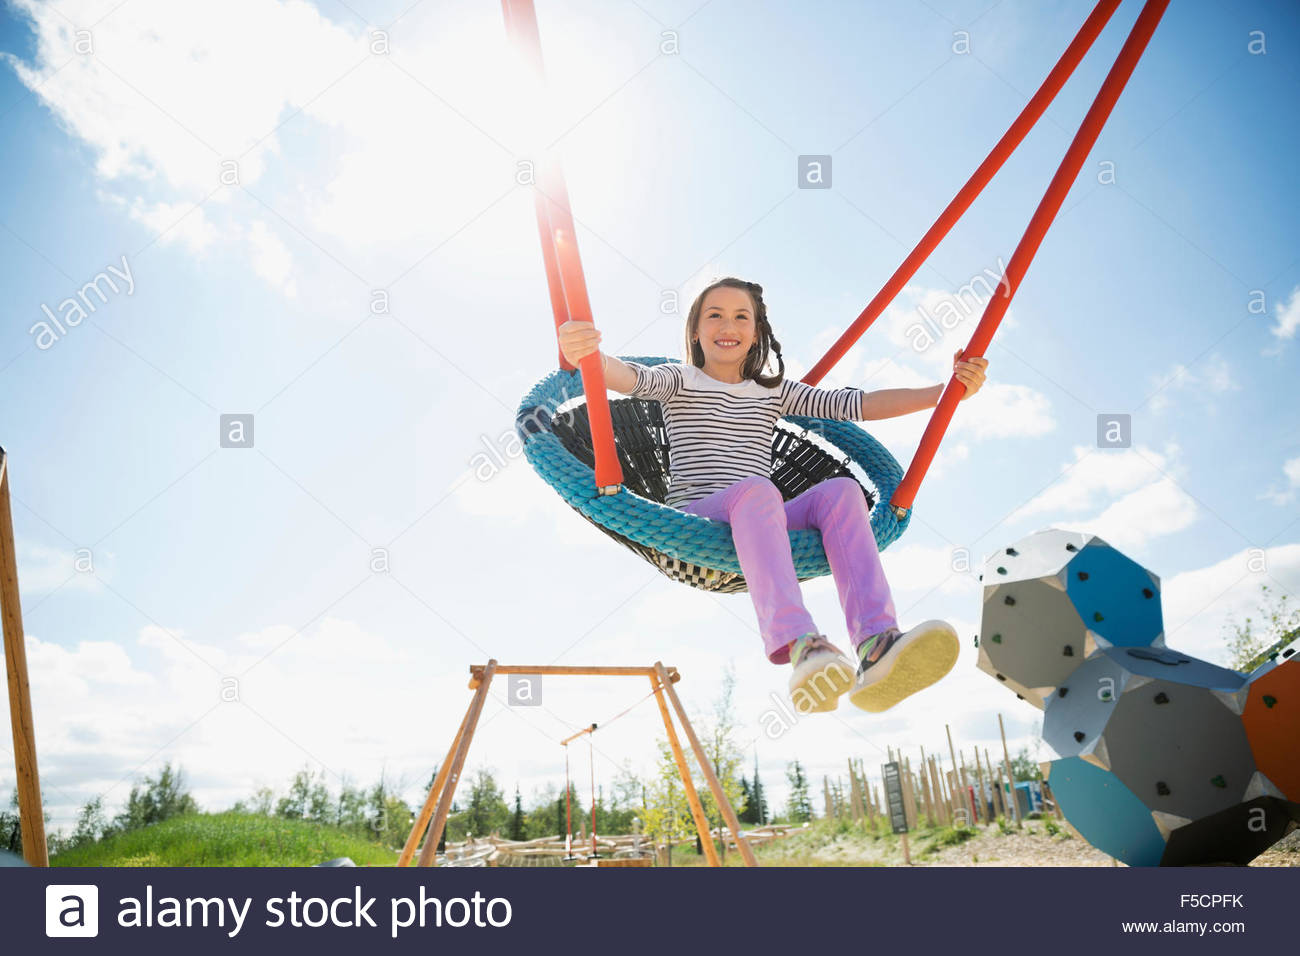 Carefree girl swinging at sunny playground - Stock Image